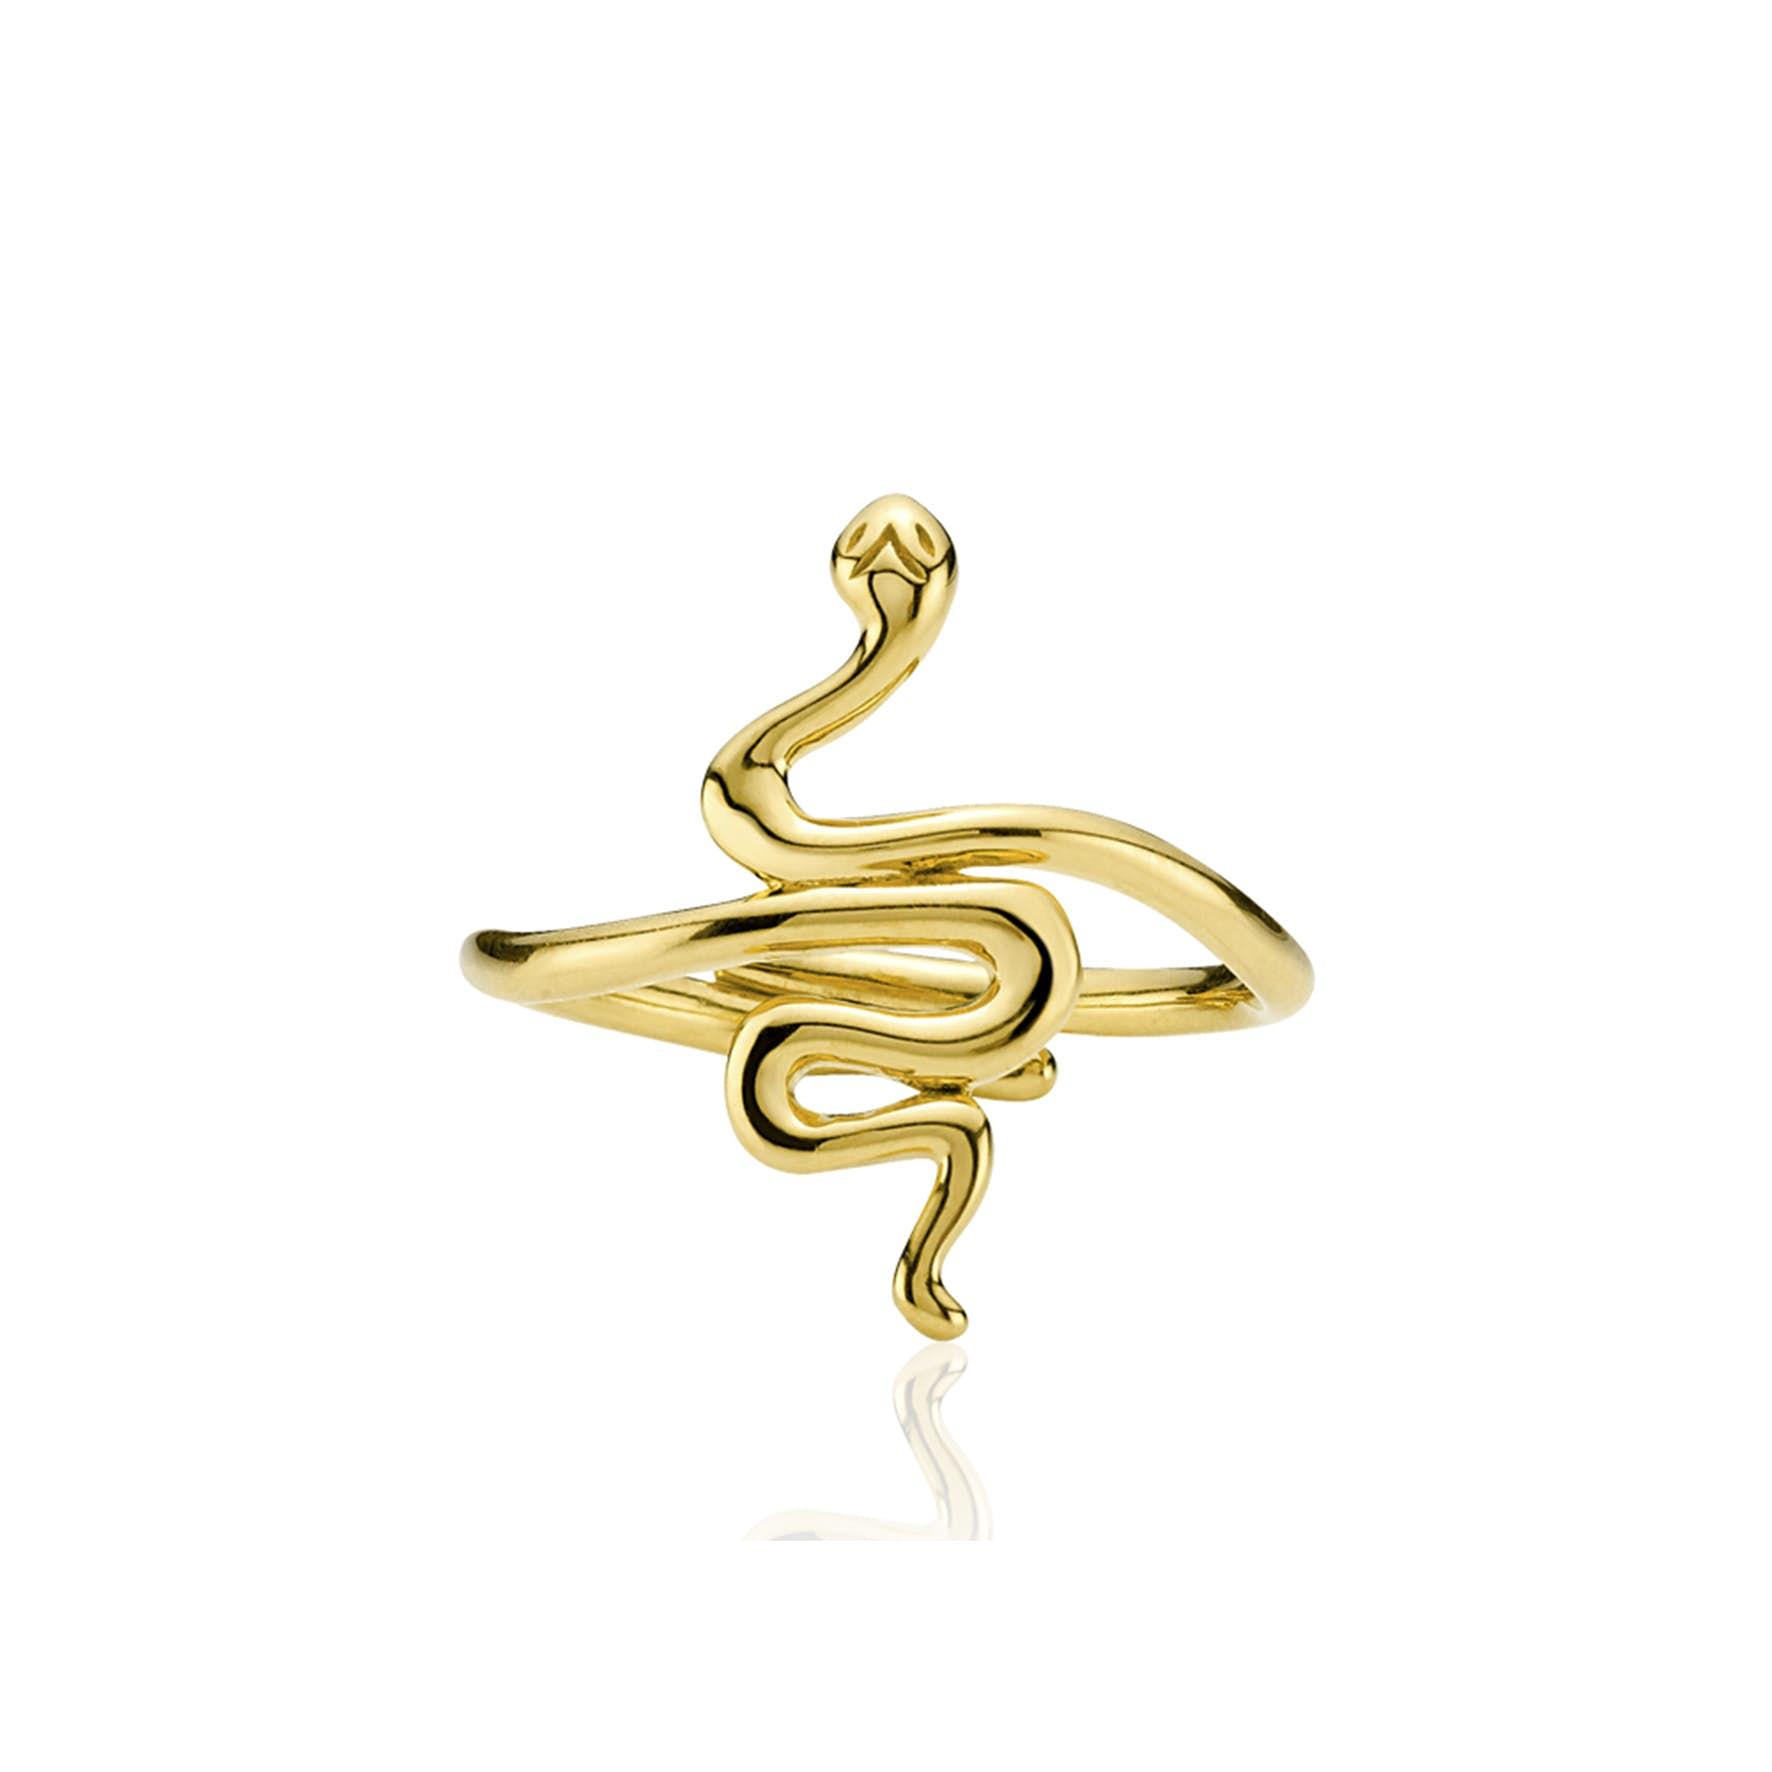 Young One Snake Ring von Sistie in Vergoldet-Silber Sterling 925